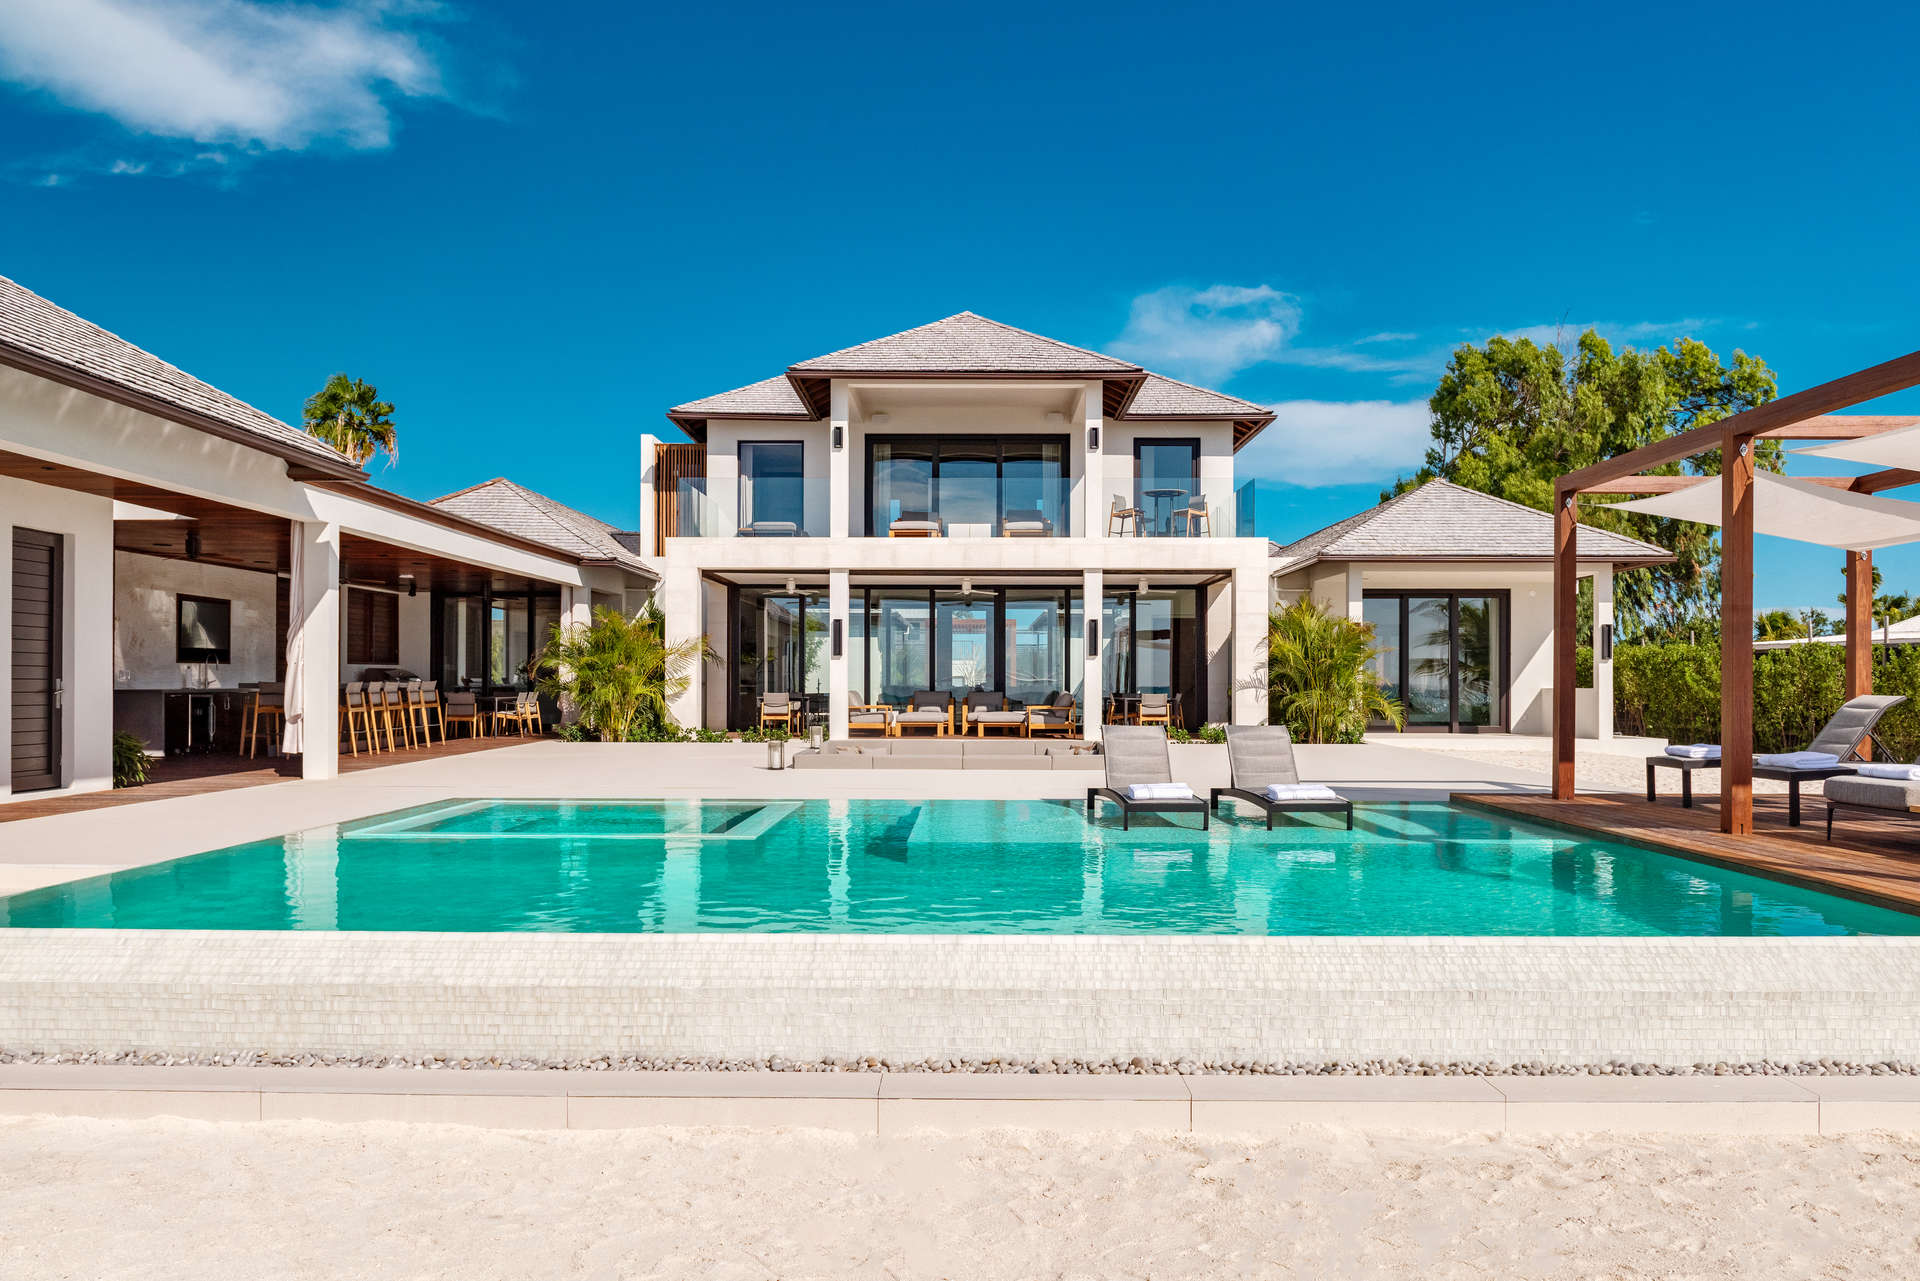 Luxury villa rentals caribbean - Turks and caicos - Providenciales - Grace bay - Vision Beach - Image 1/24